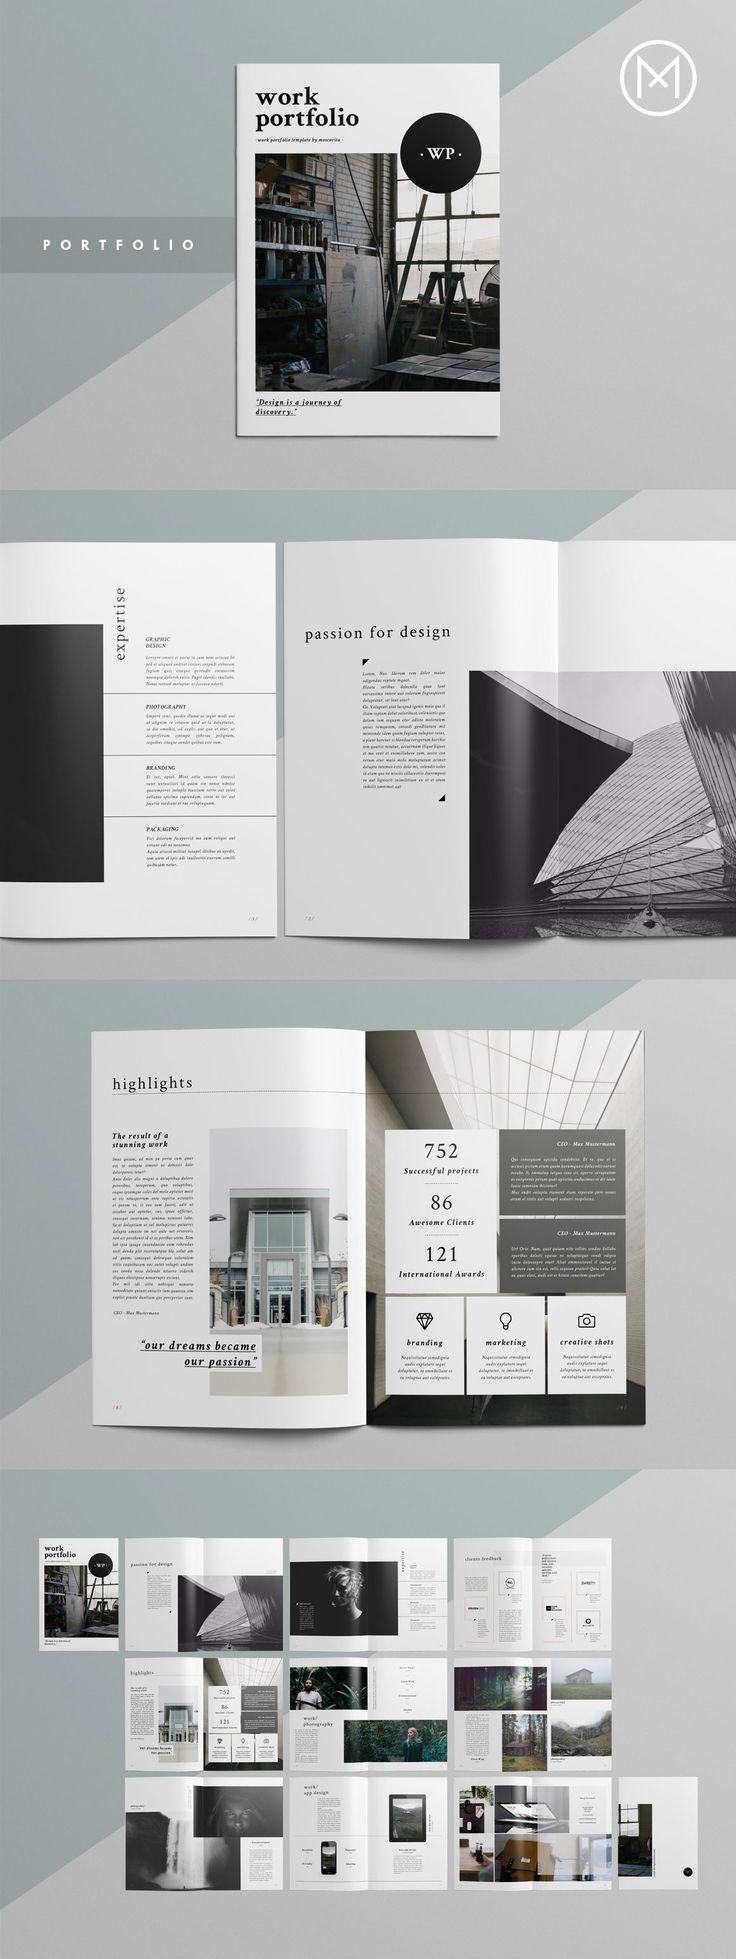 Simple layout design ideas #business #portfolio